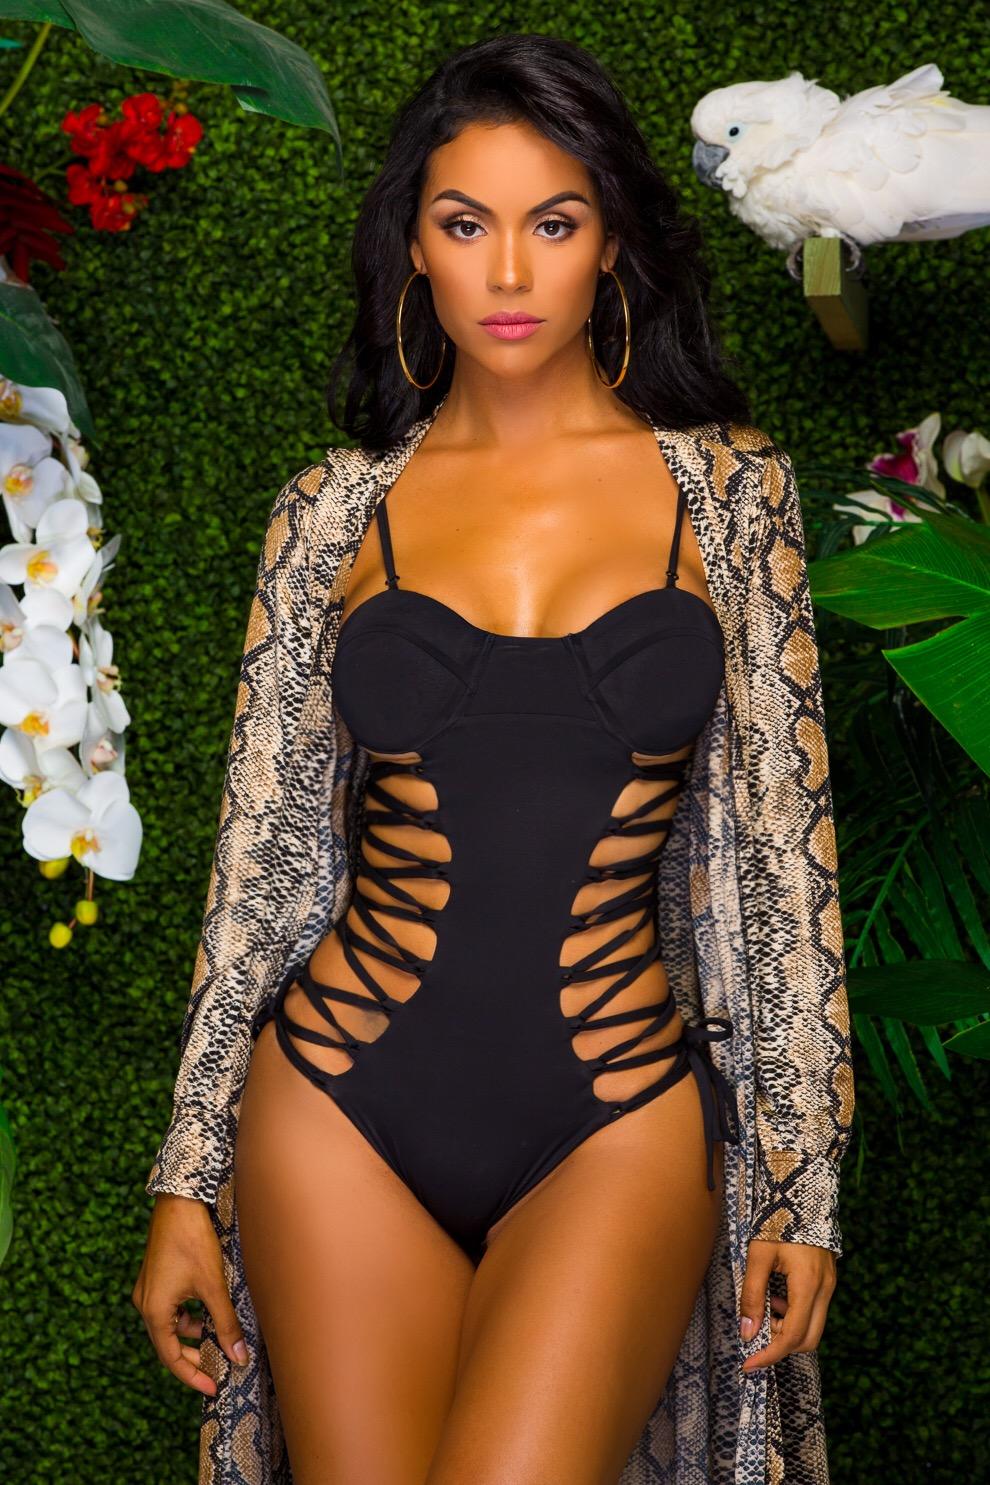 aeb2b8841fd Criss Cross Romance Monokini – OMG Miami Swimwear